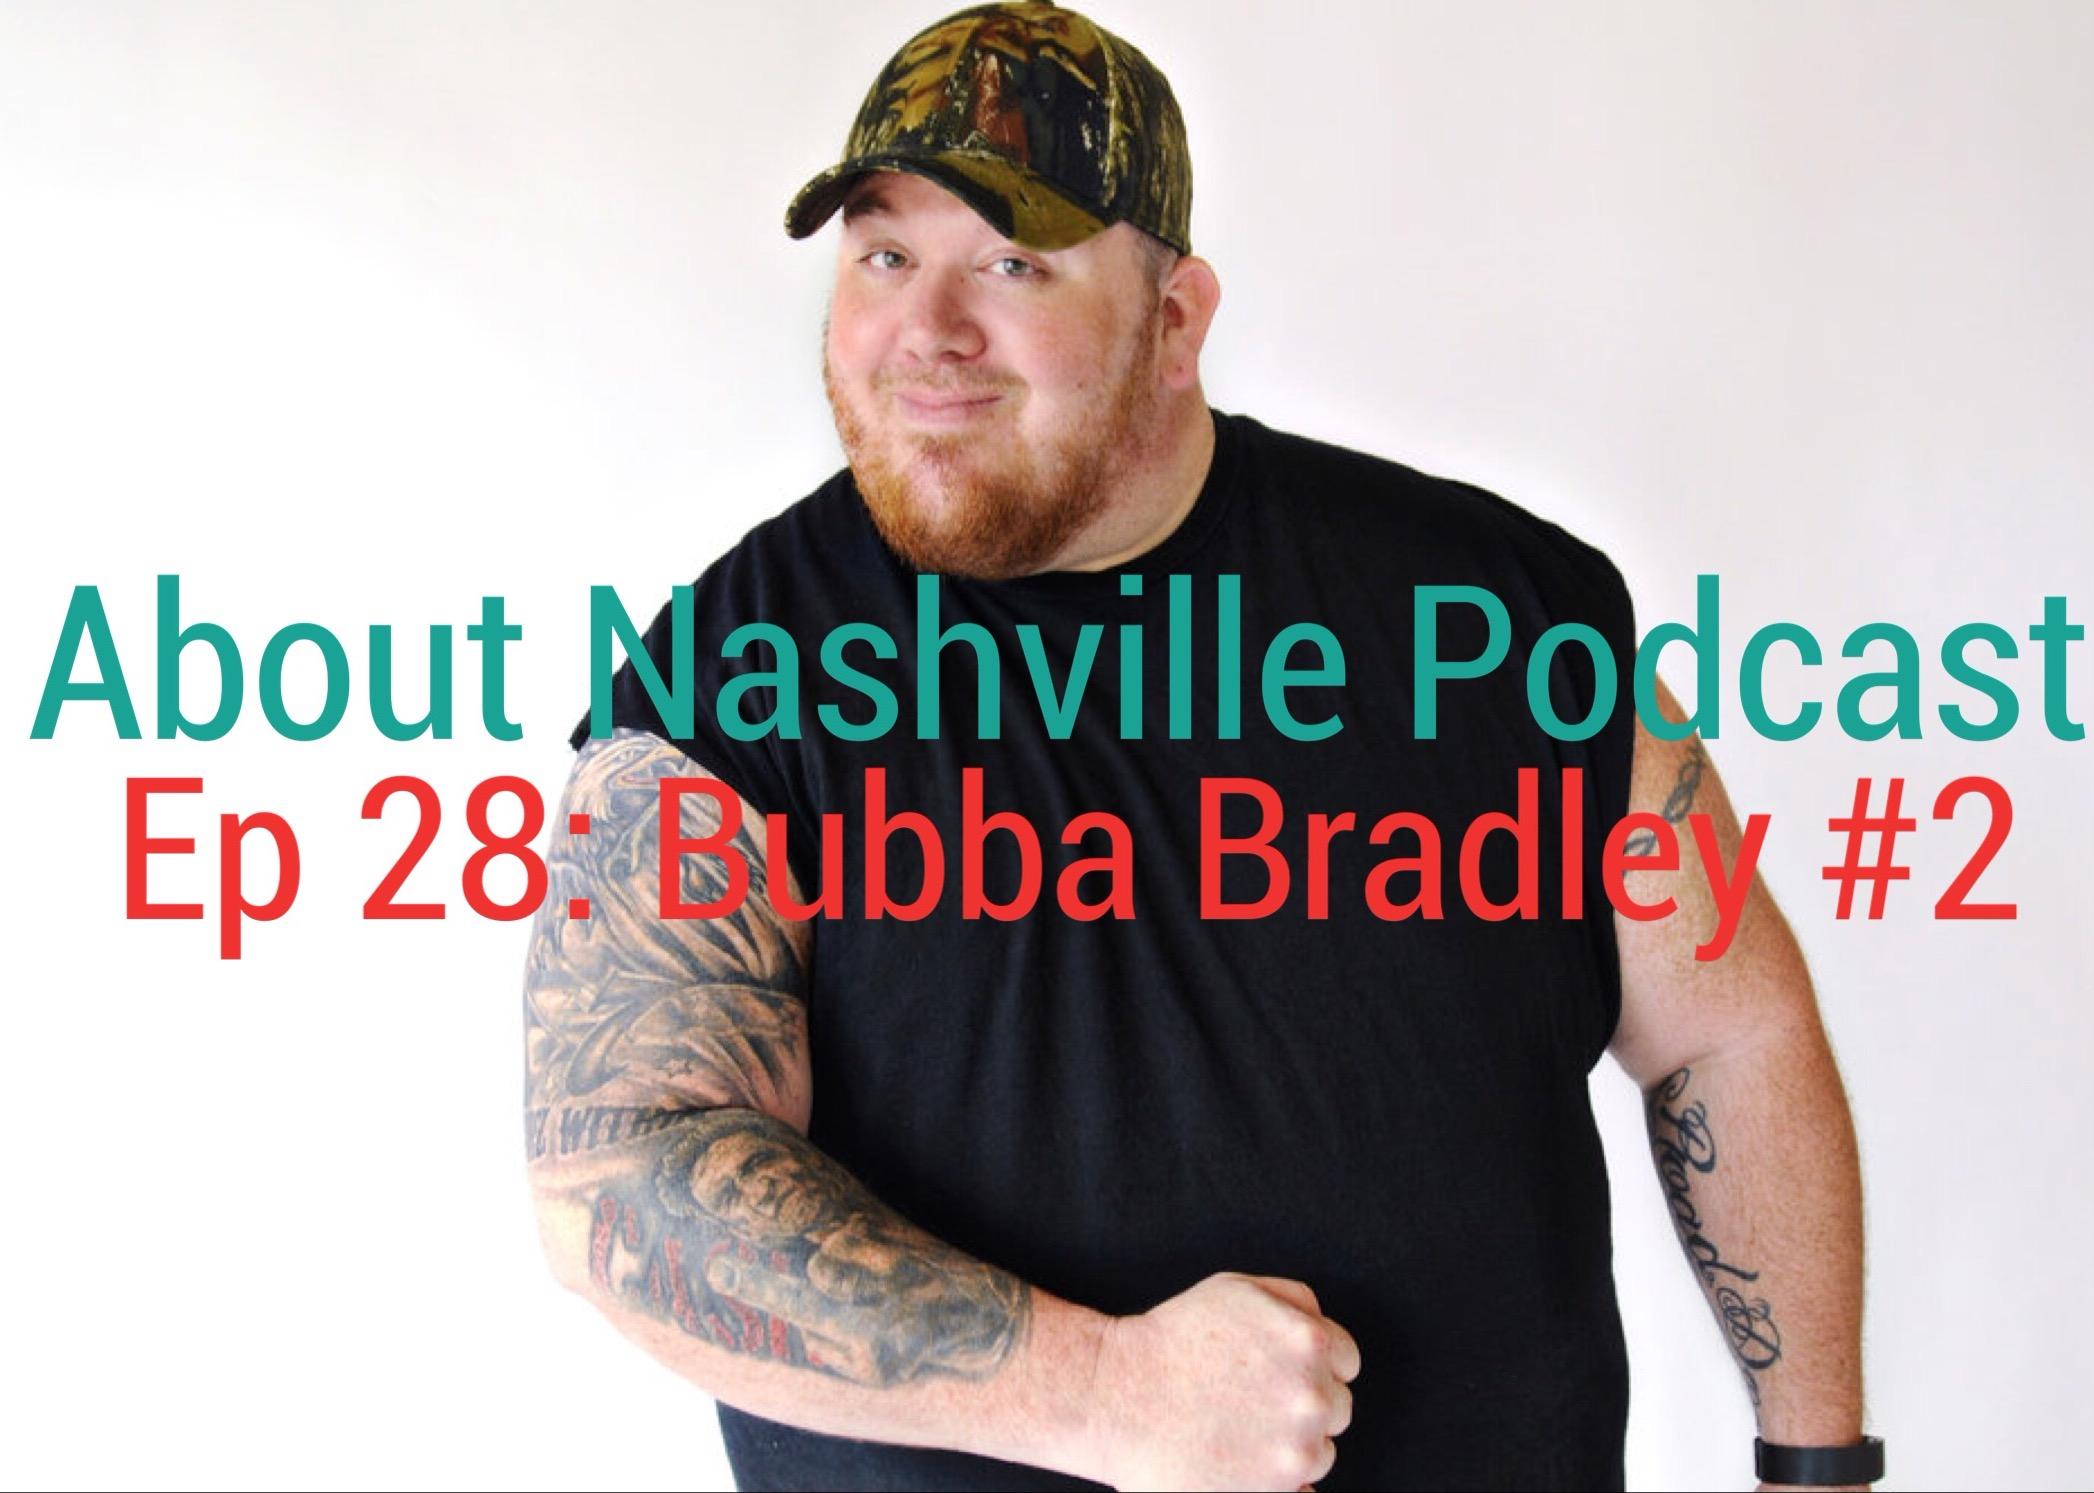 Ep 28: Bubba Bradley #2